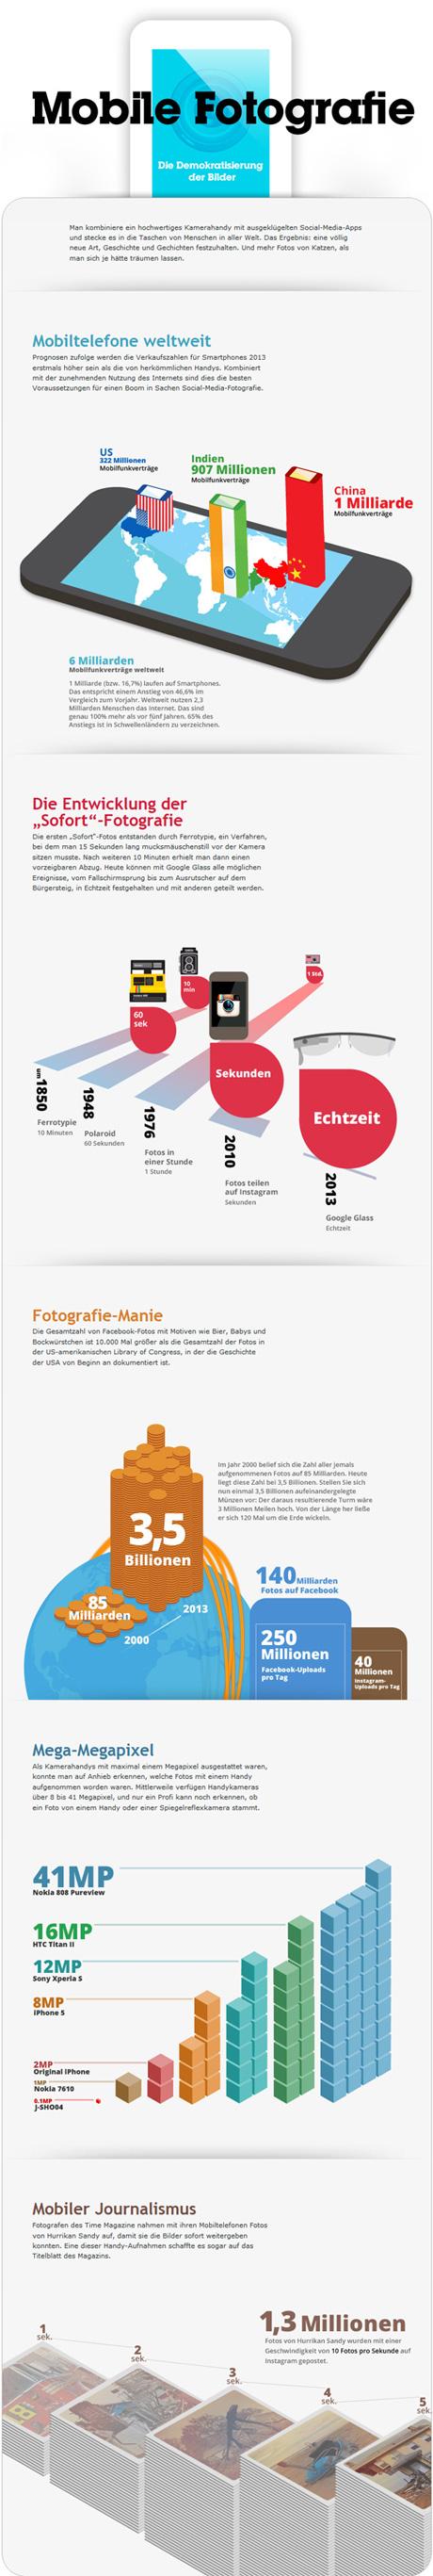 Infografik Mobile Fotografie